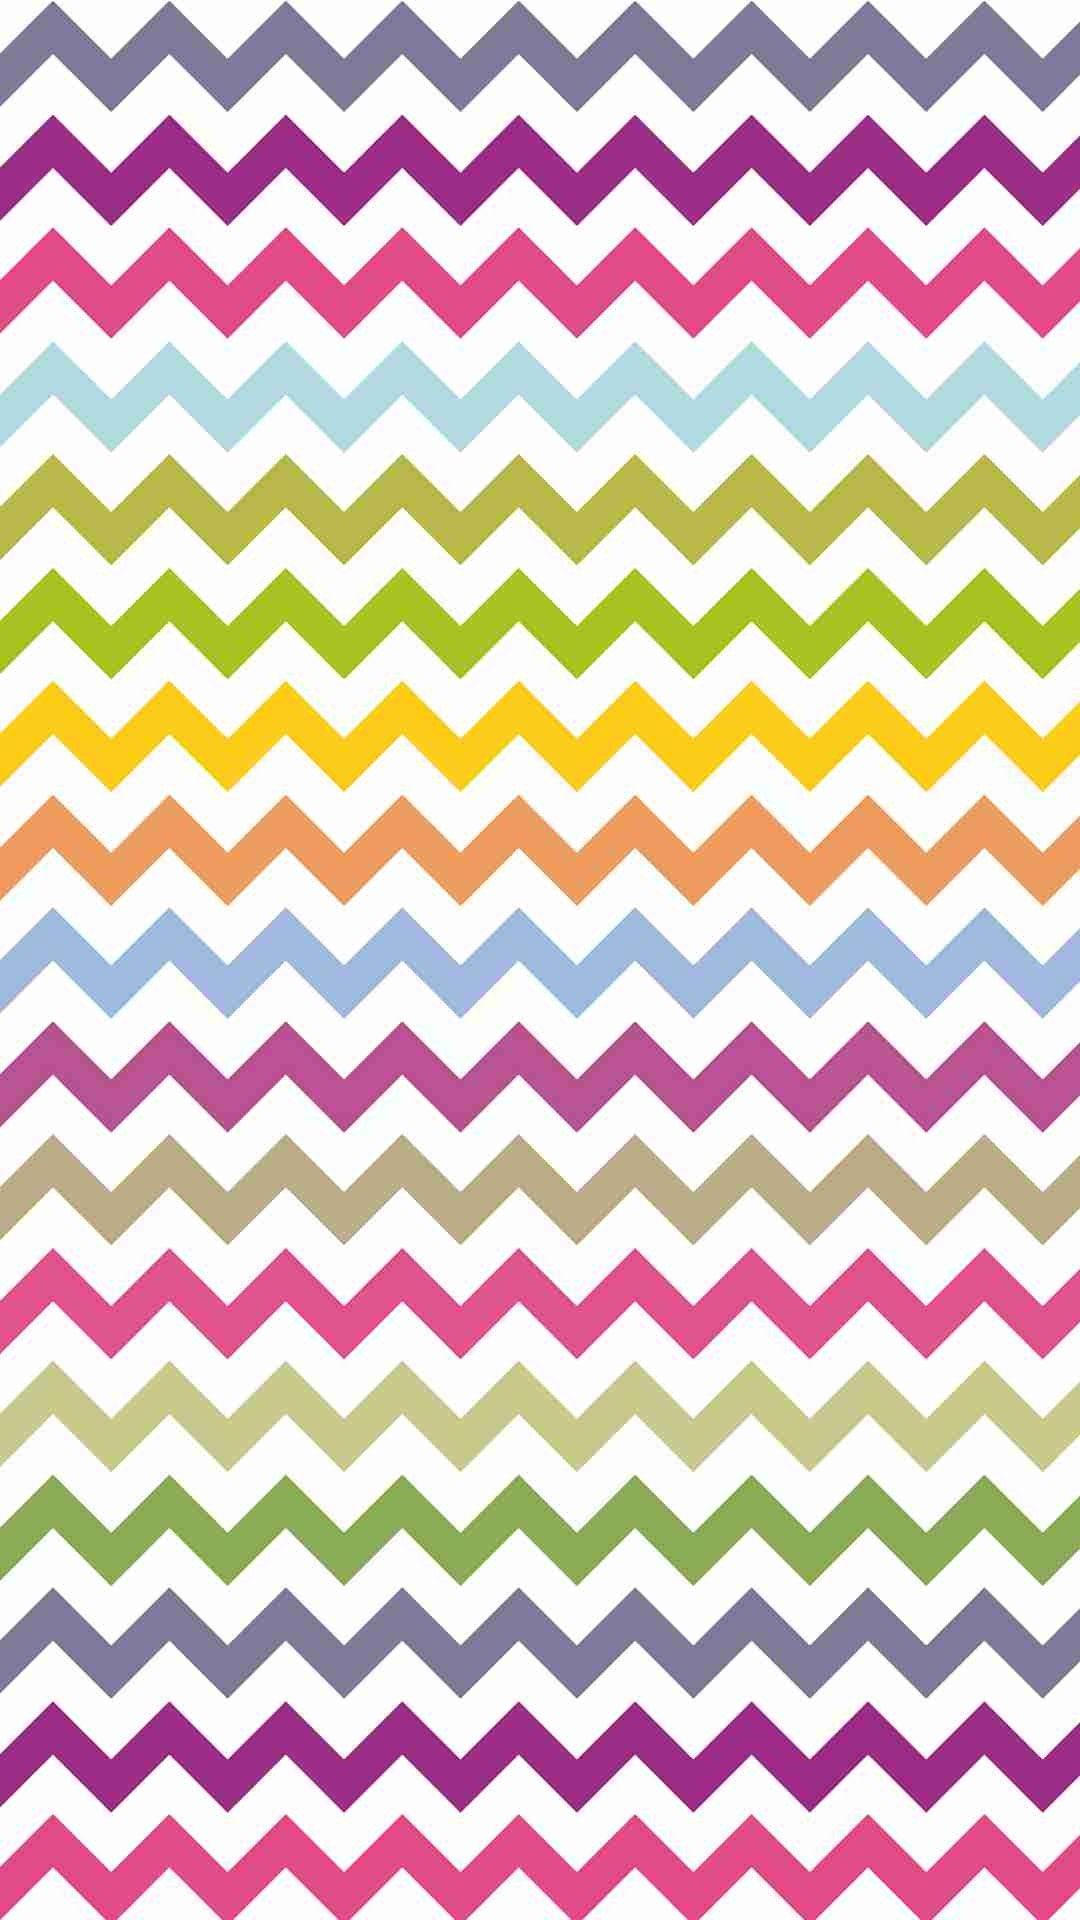 bright colors zigzag and chevron iphone 6 plus wallpaper